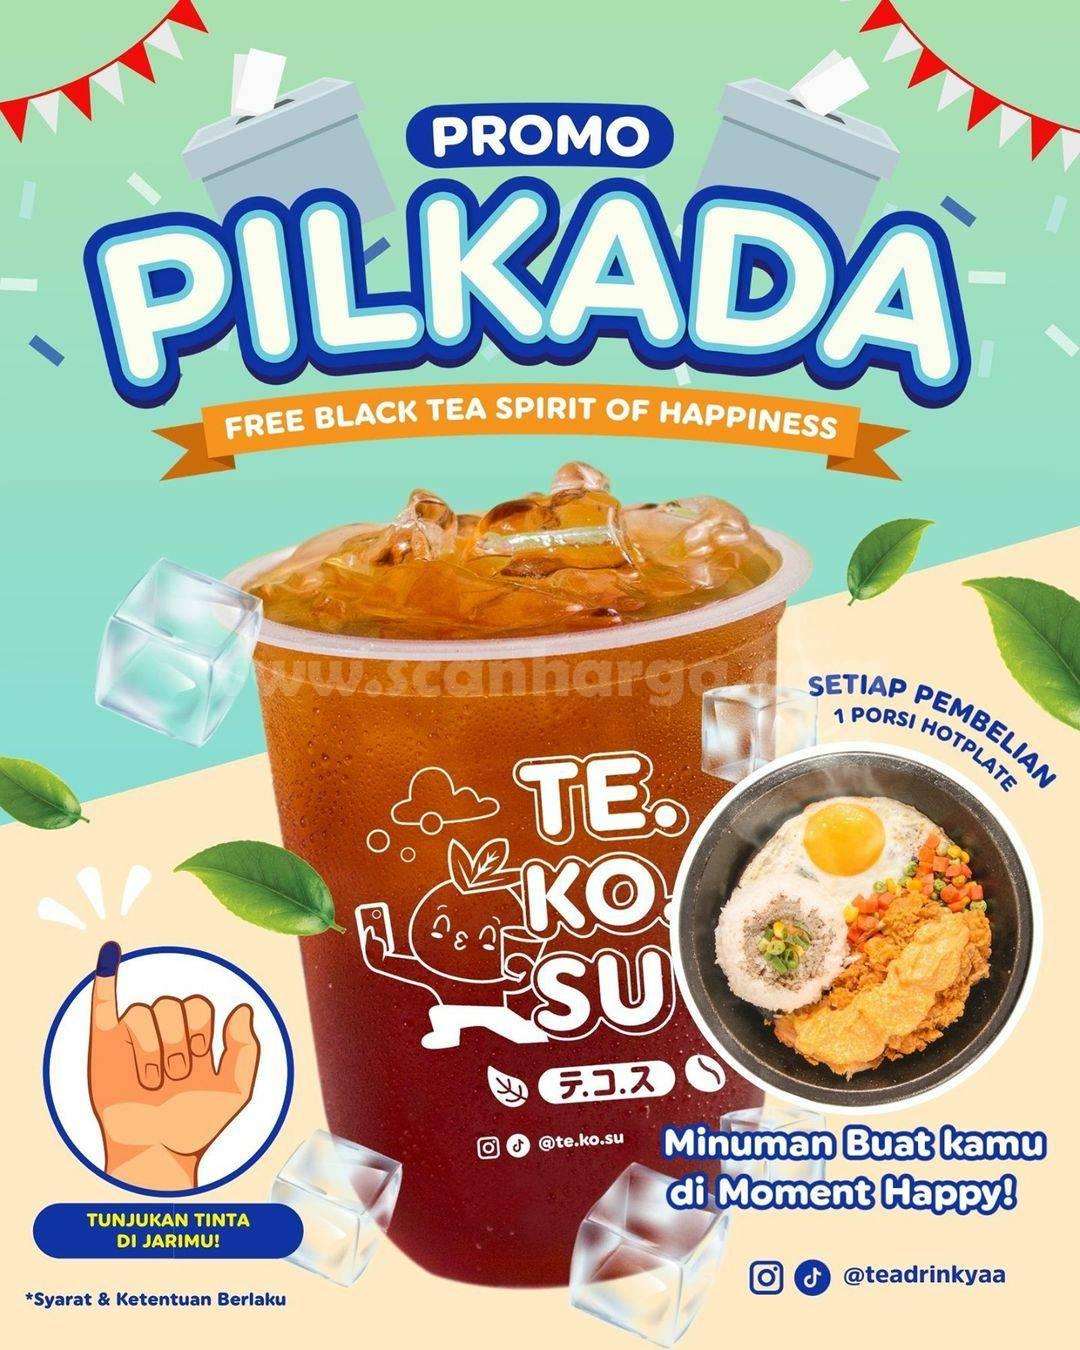 Promo Teadrink Yaa Pilkada! FREE Black Tea Spirit of Happiness